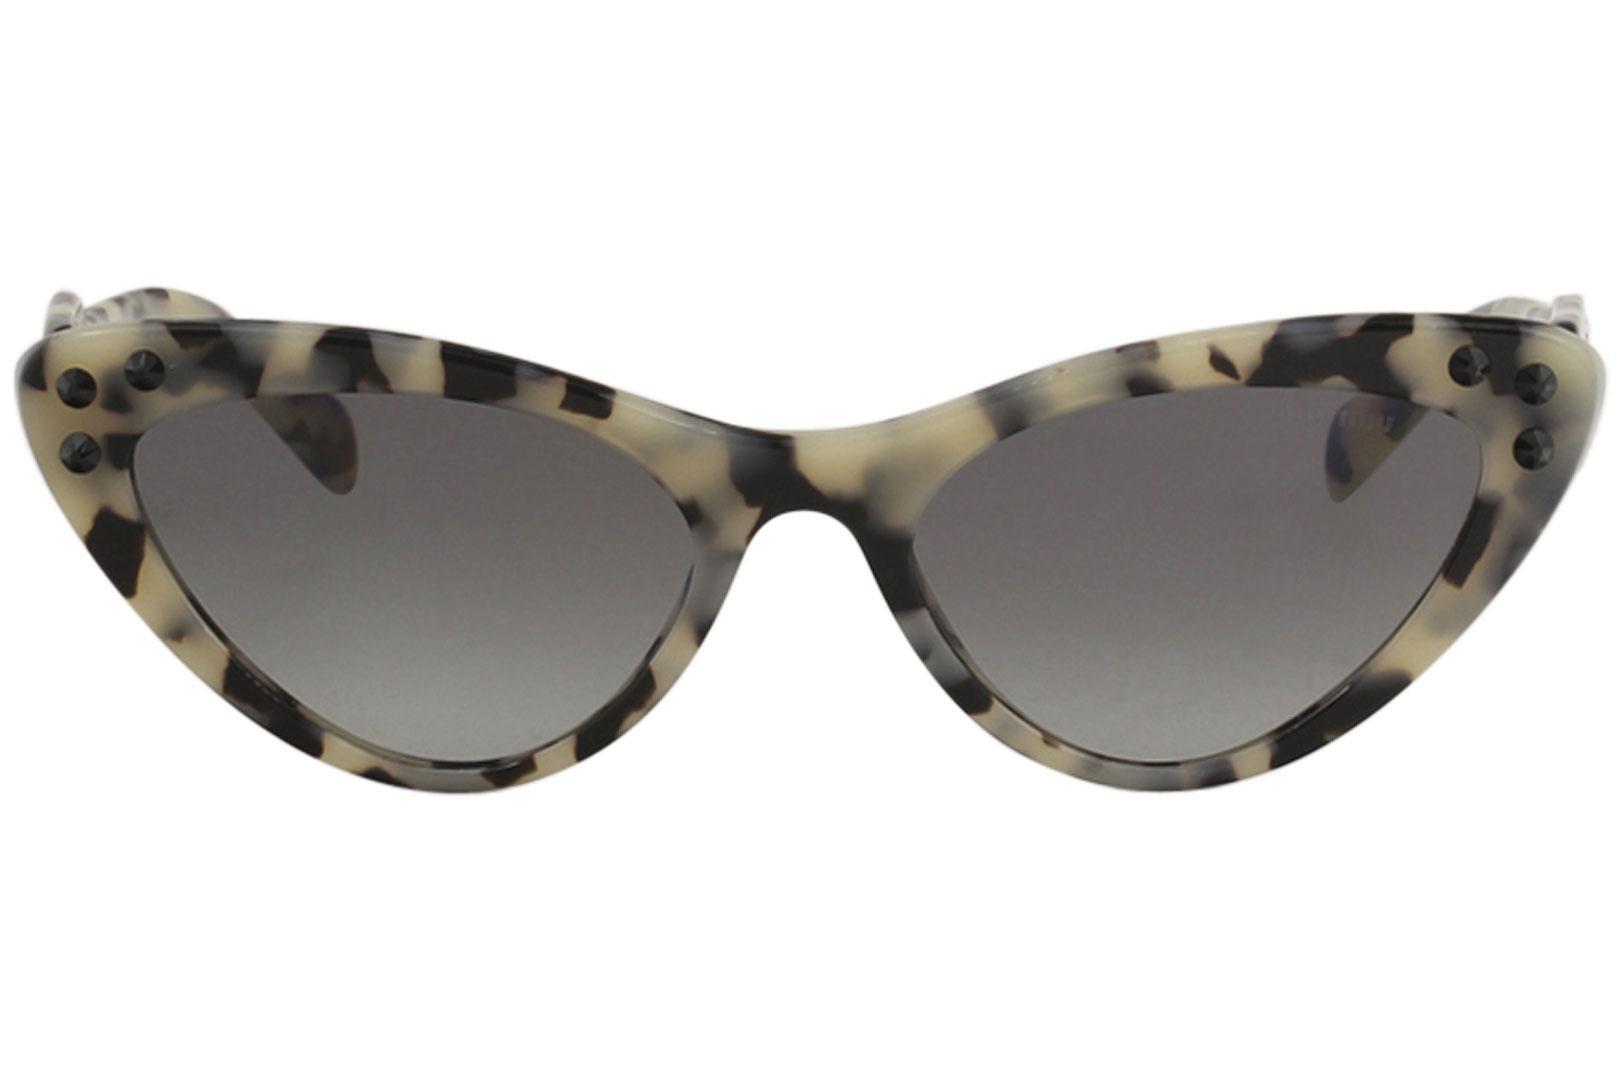 91ff80a26c73 Miu Miu Women s SMU05T SMU 05T Fashion Cat Eye Sunglasses